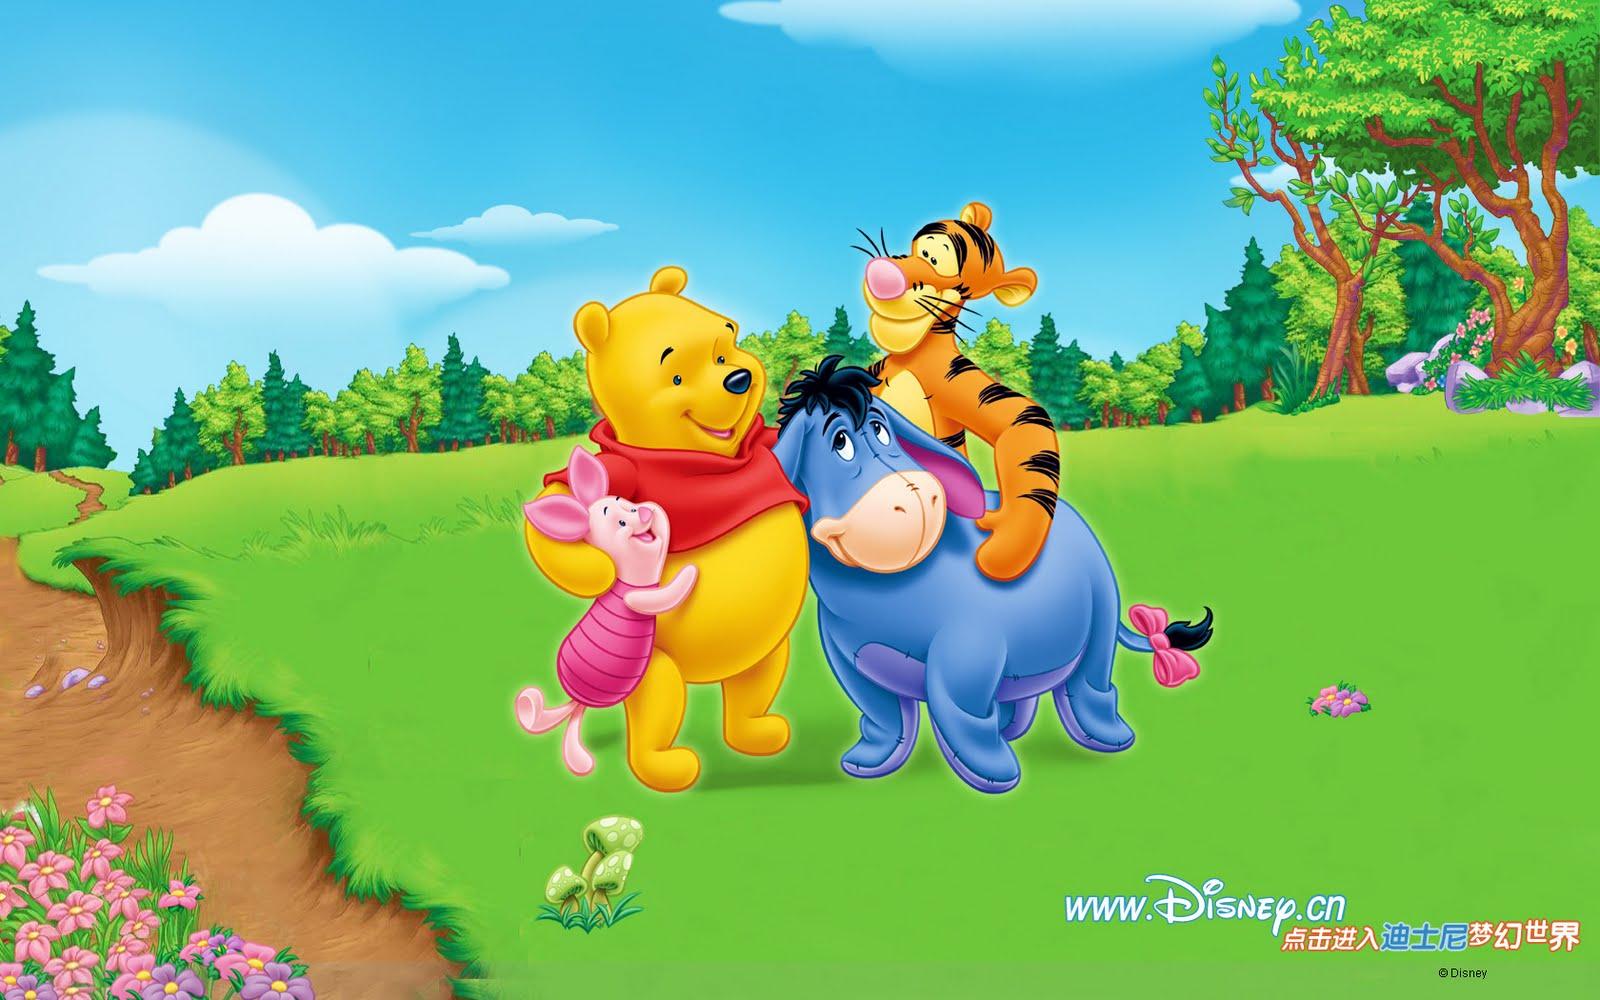 Wallpapers De Winnie Pooh By Disney I  8 Im  Genes